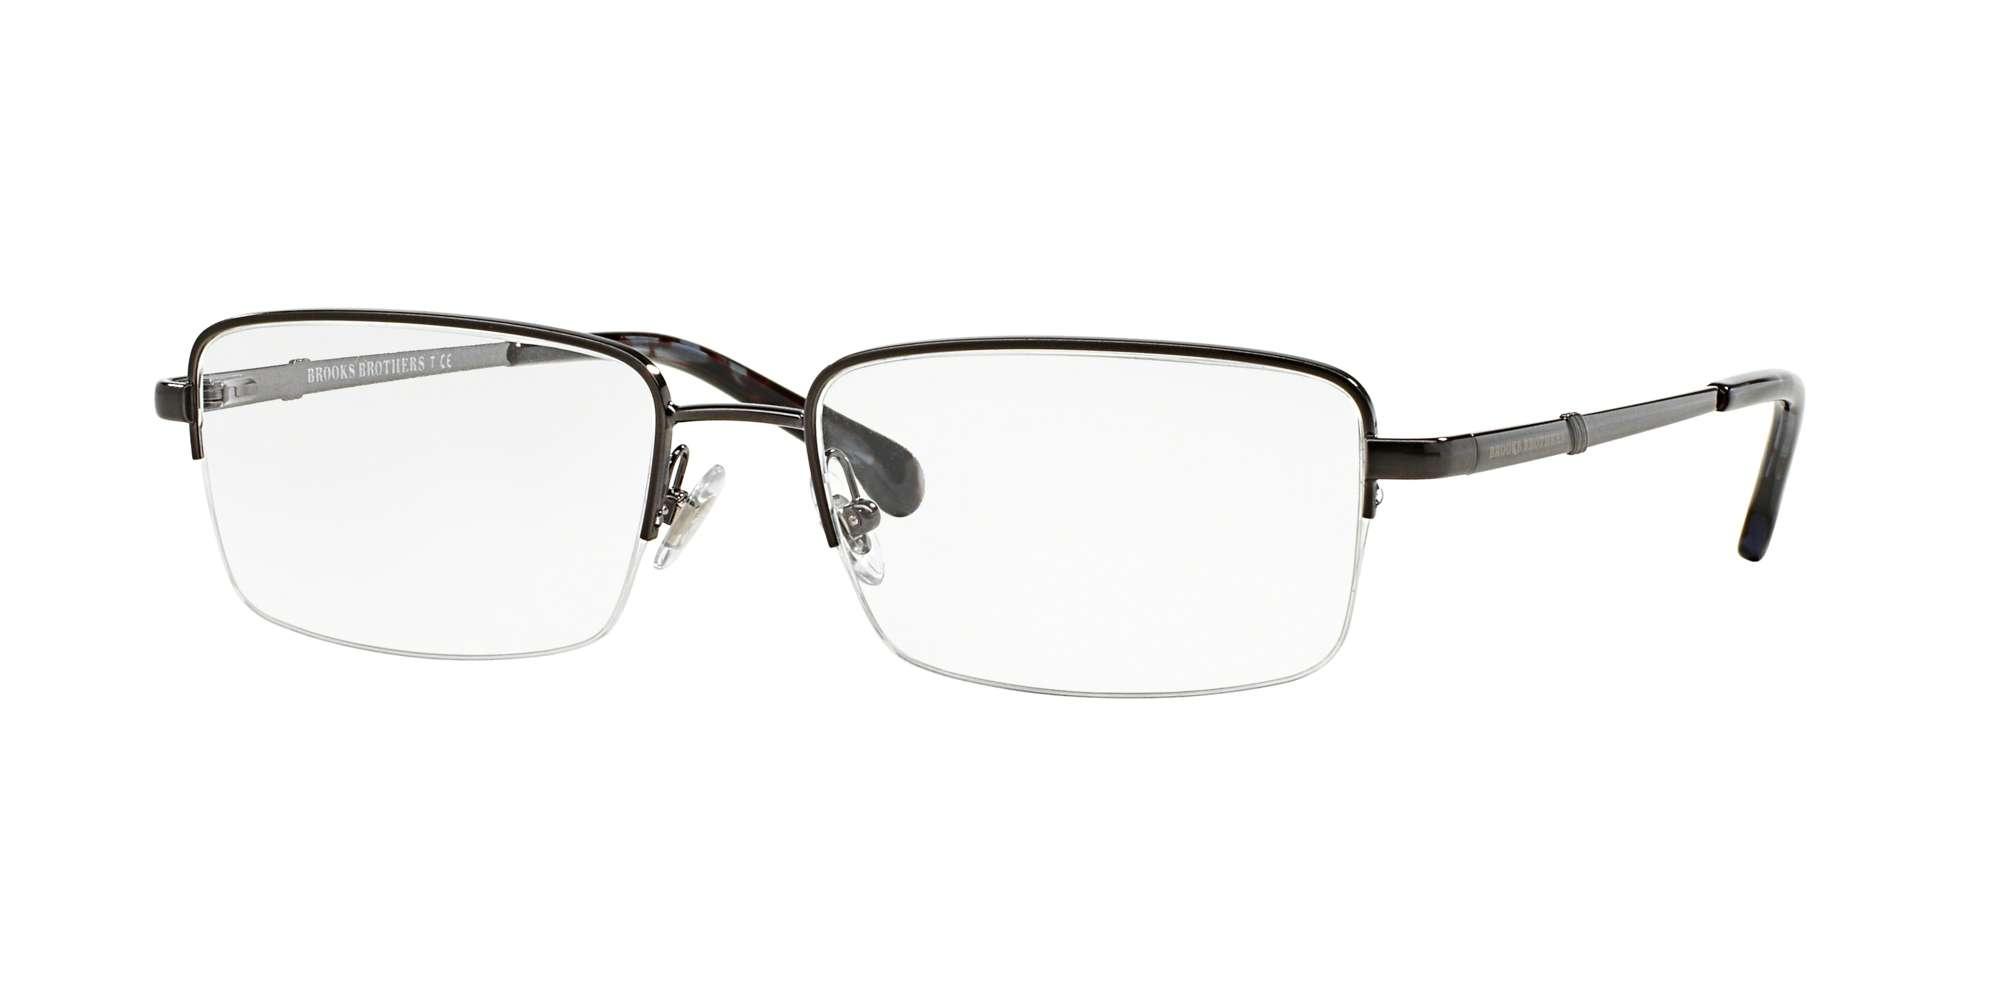 54793e6dc7 Brooks Brothers BB1035 Prescription Eyeglasses